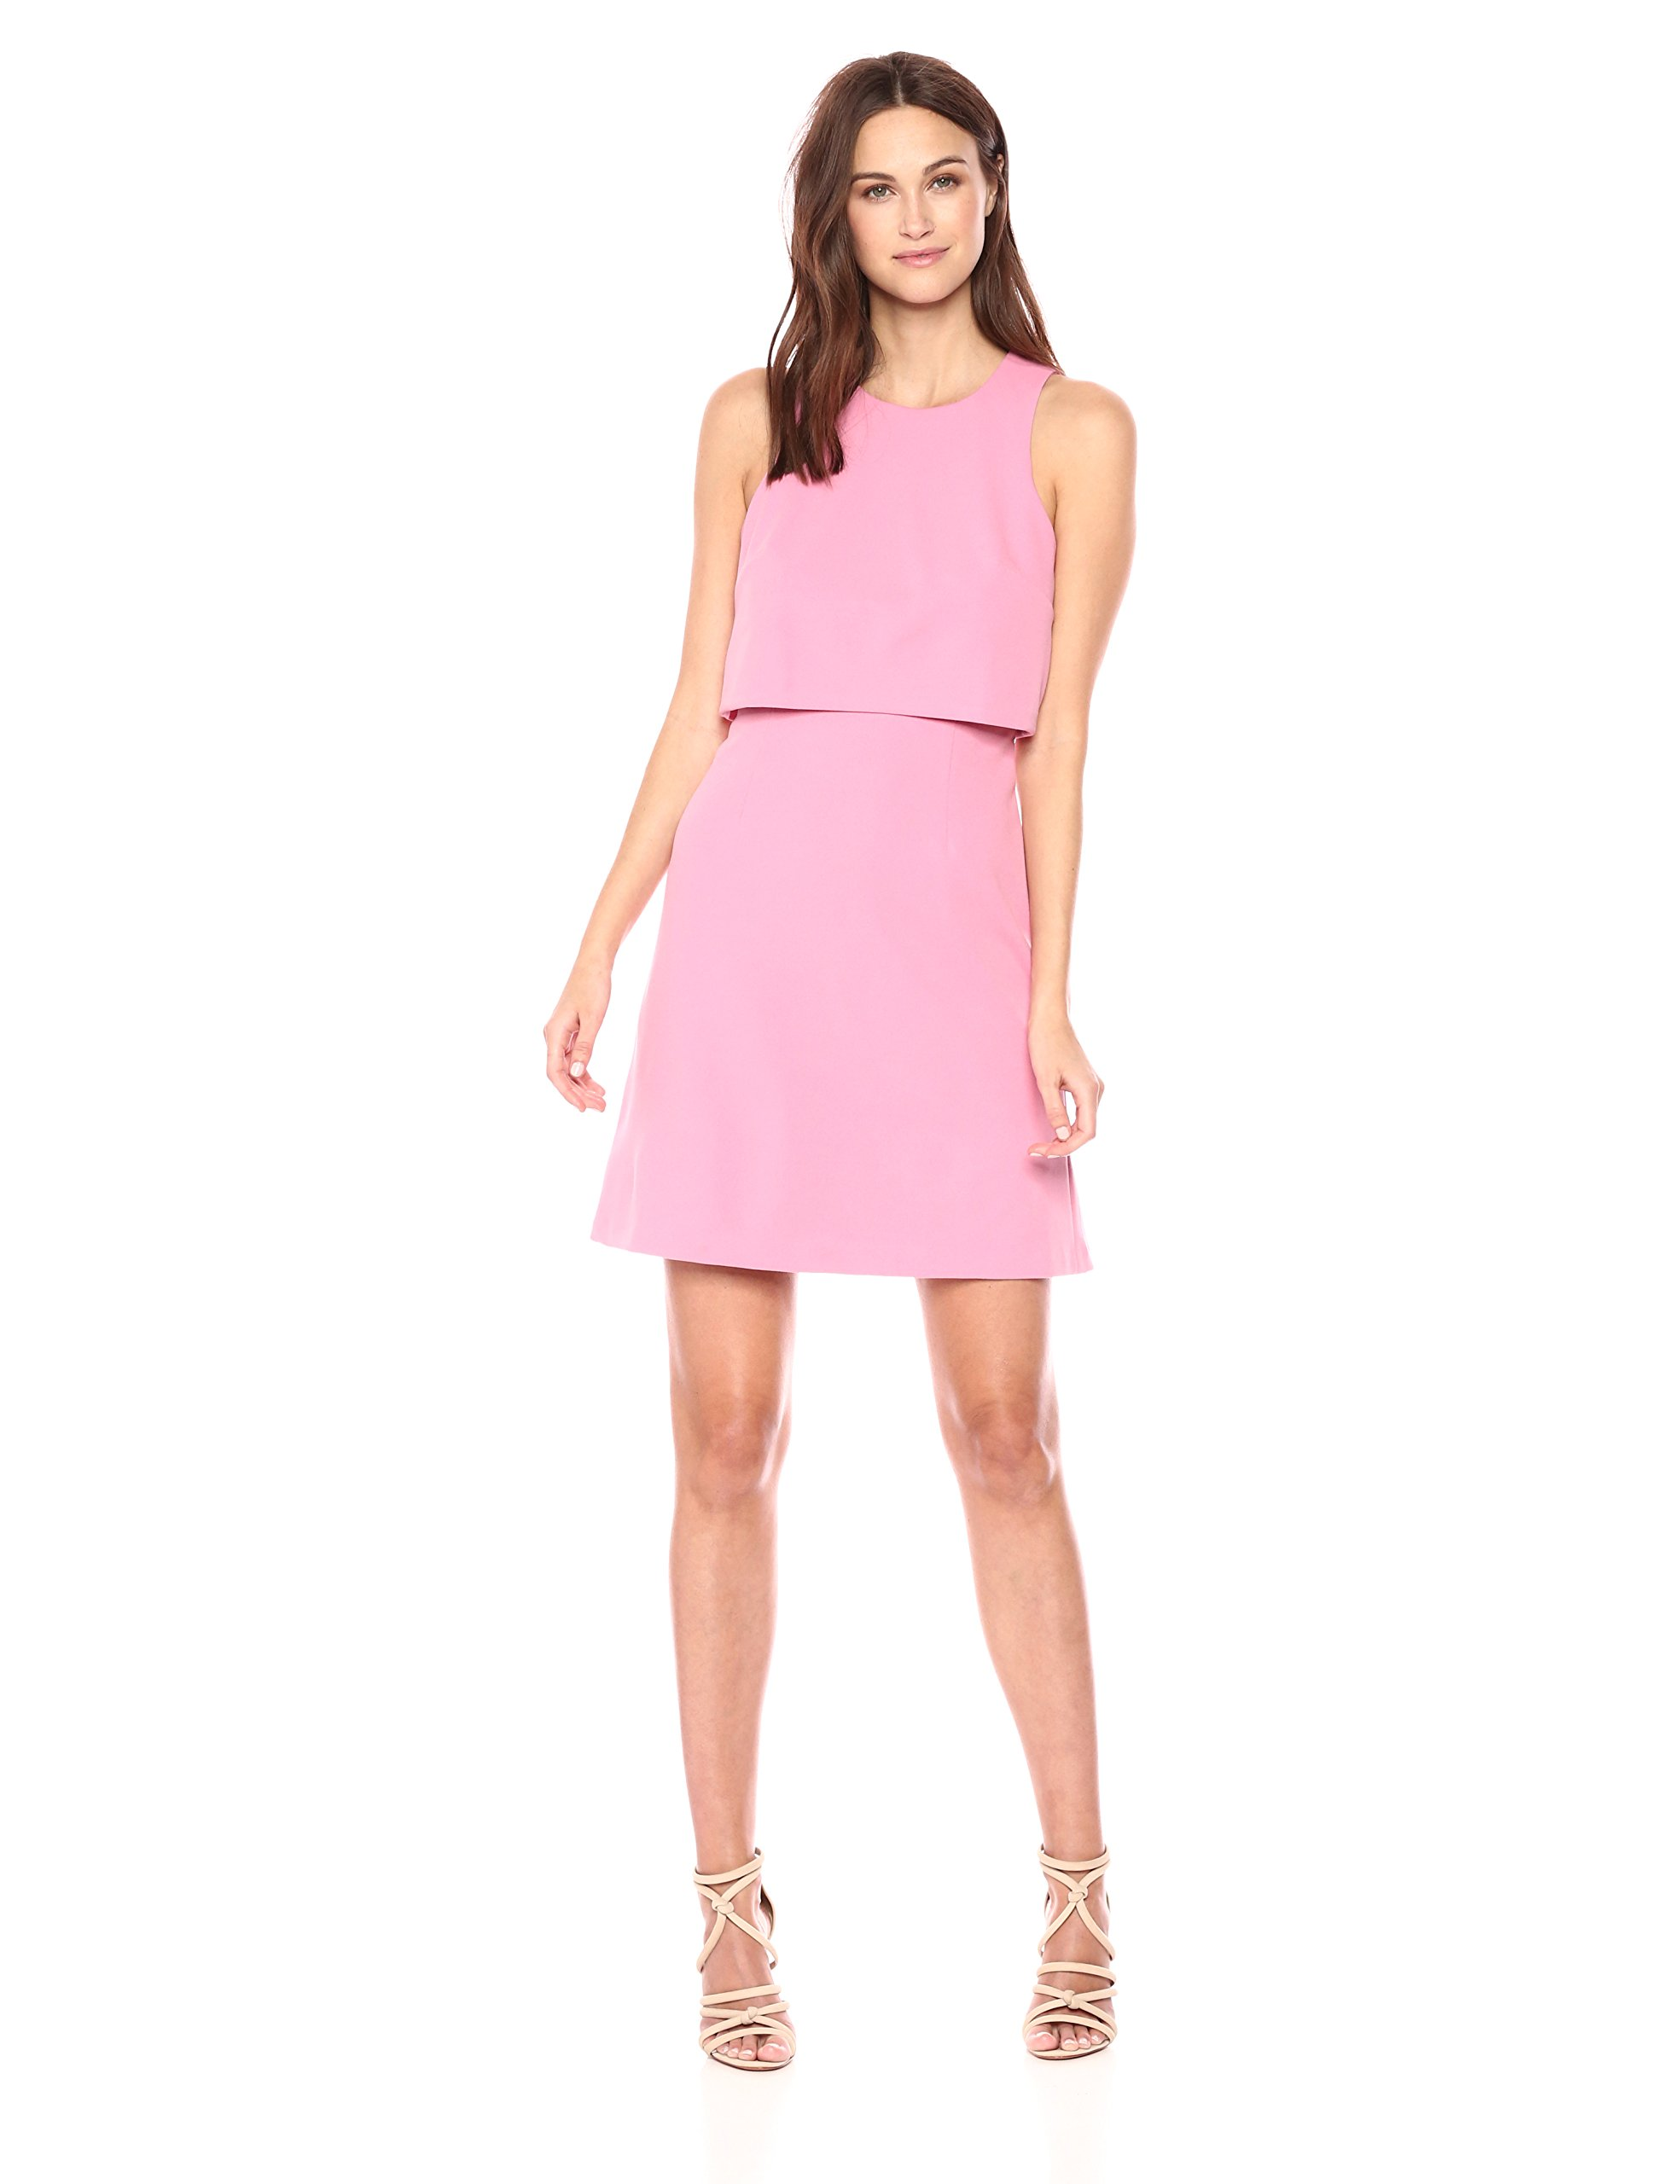 Donna Morgan Women's Crepe Sleeveless Pop-Over Dress, Pink Sherbet, 4 by Donna Morgan